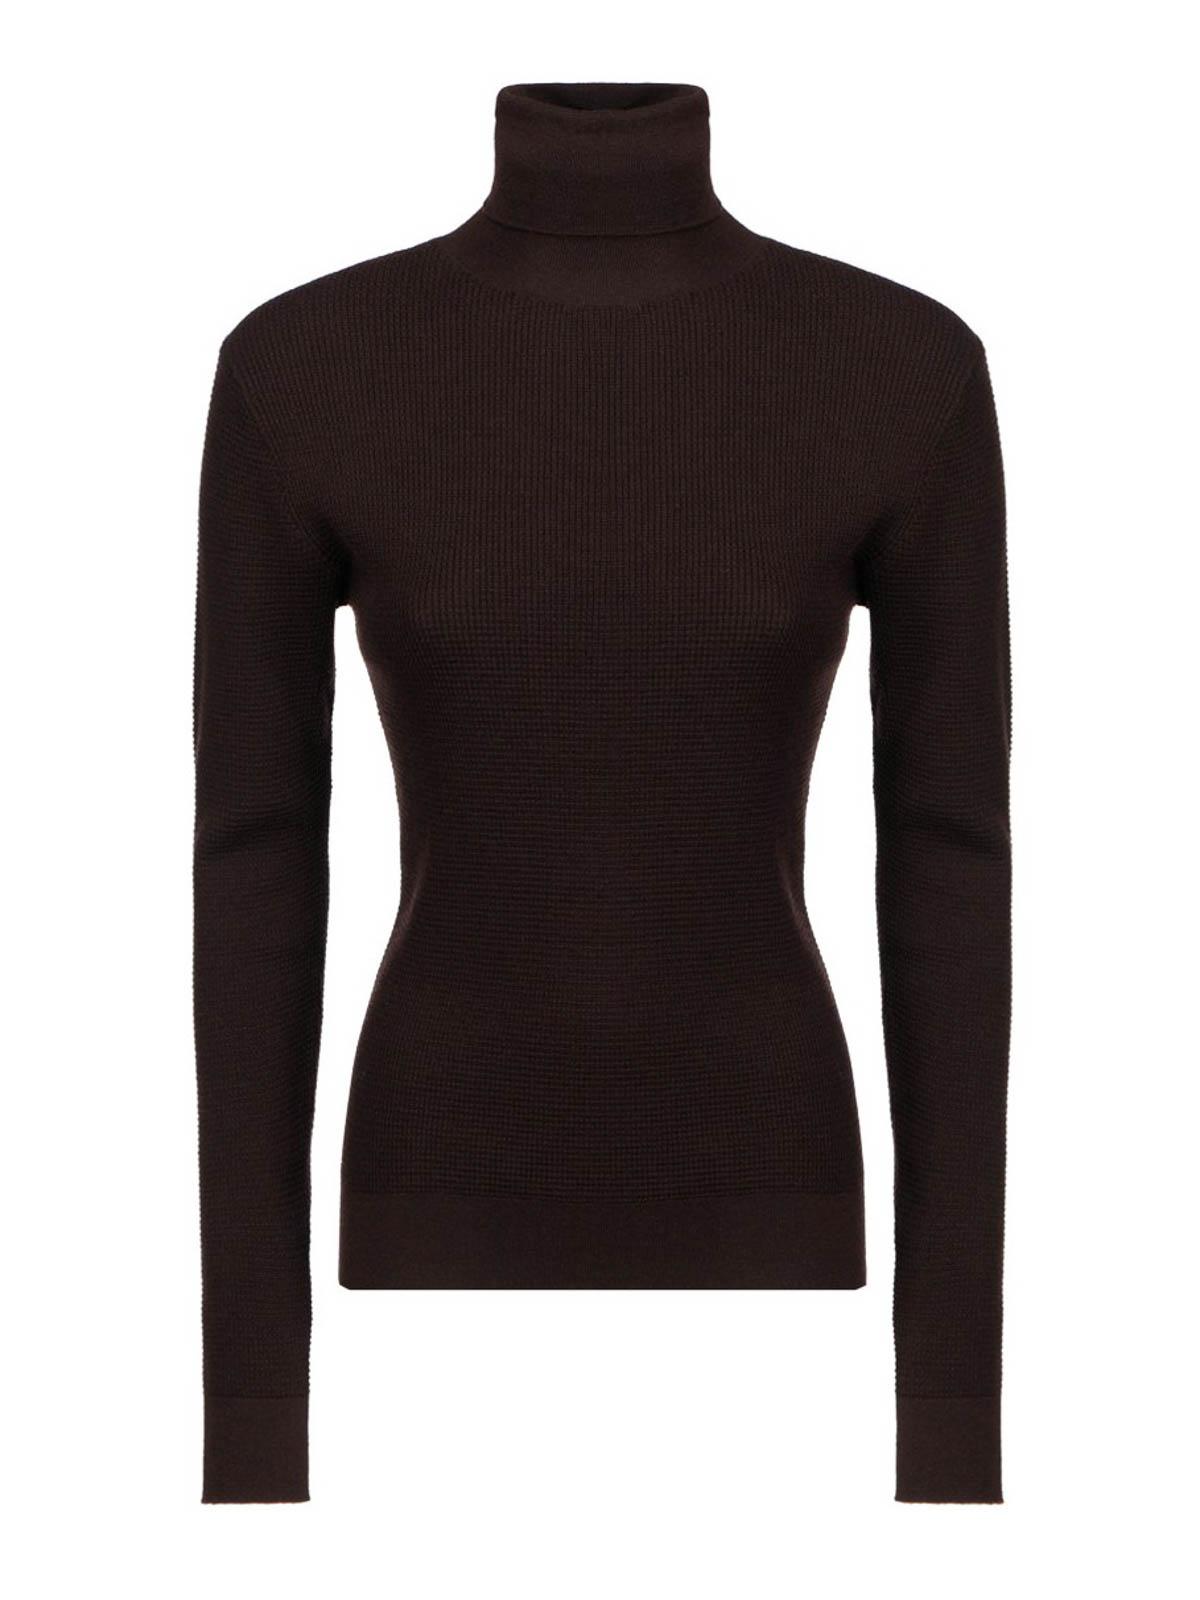 Dolce & Gabbana Silk-cashmere Blend Turtleneck In Black